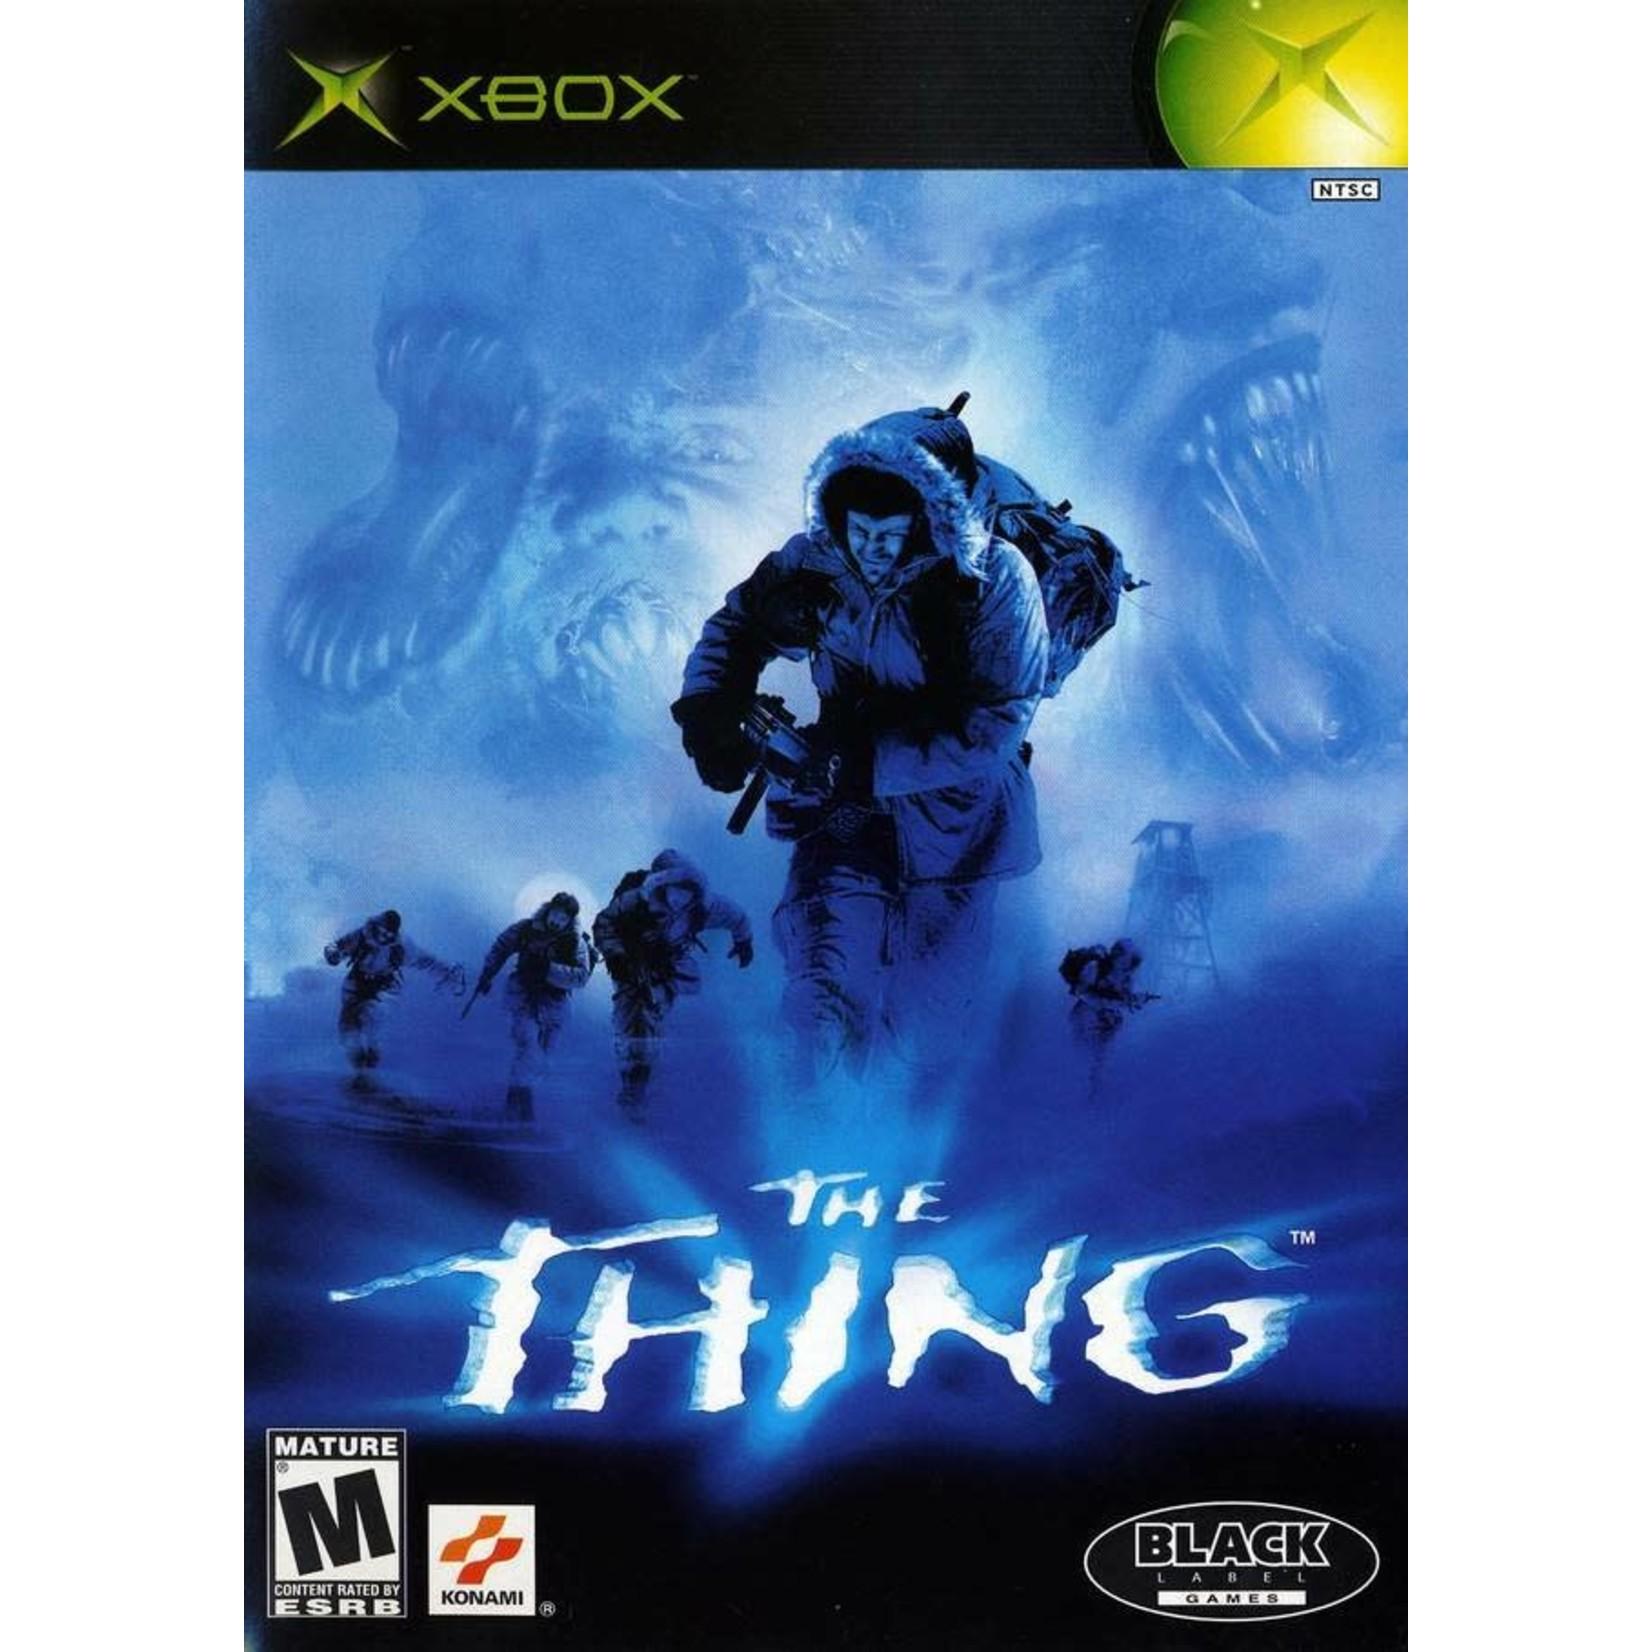 XBU-THE THING